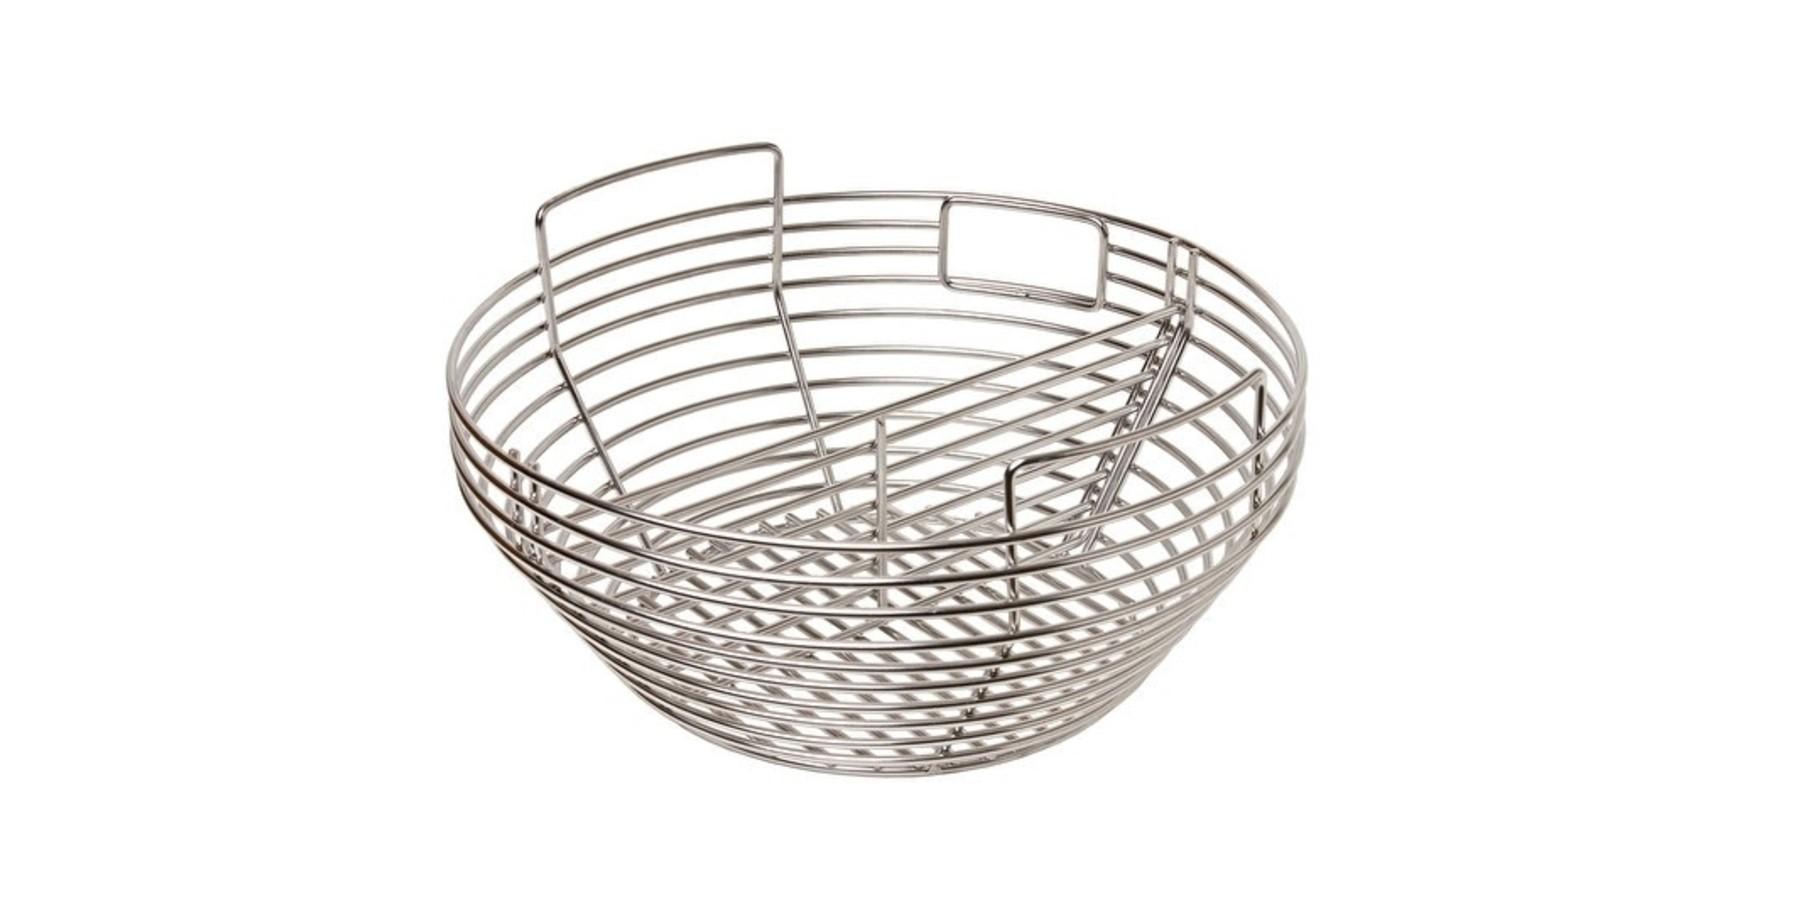 Charcoal Basket Large of kolenmand